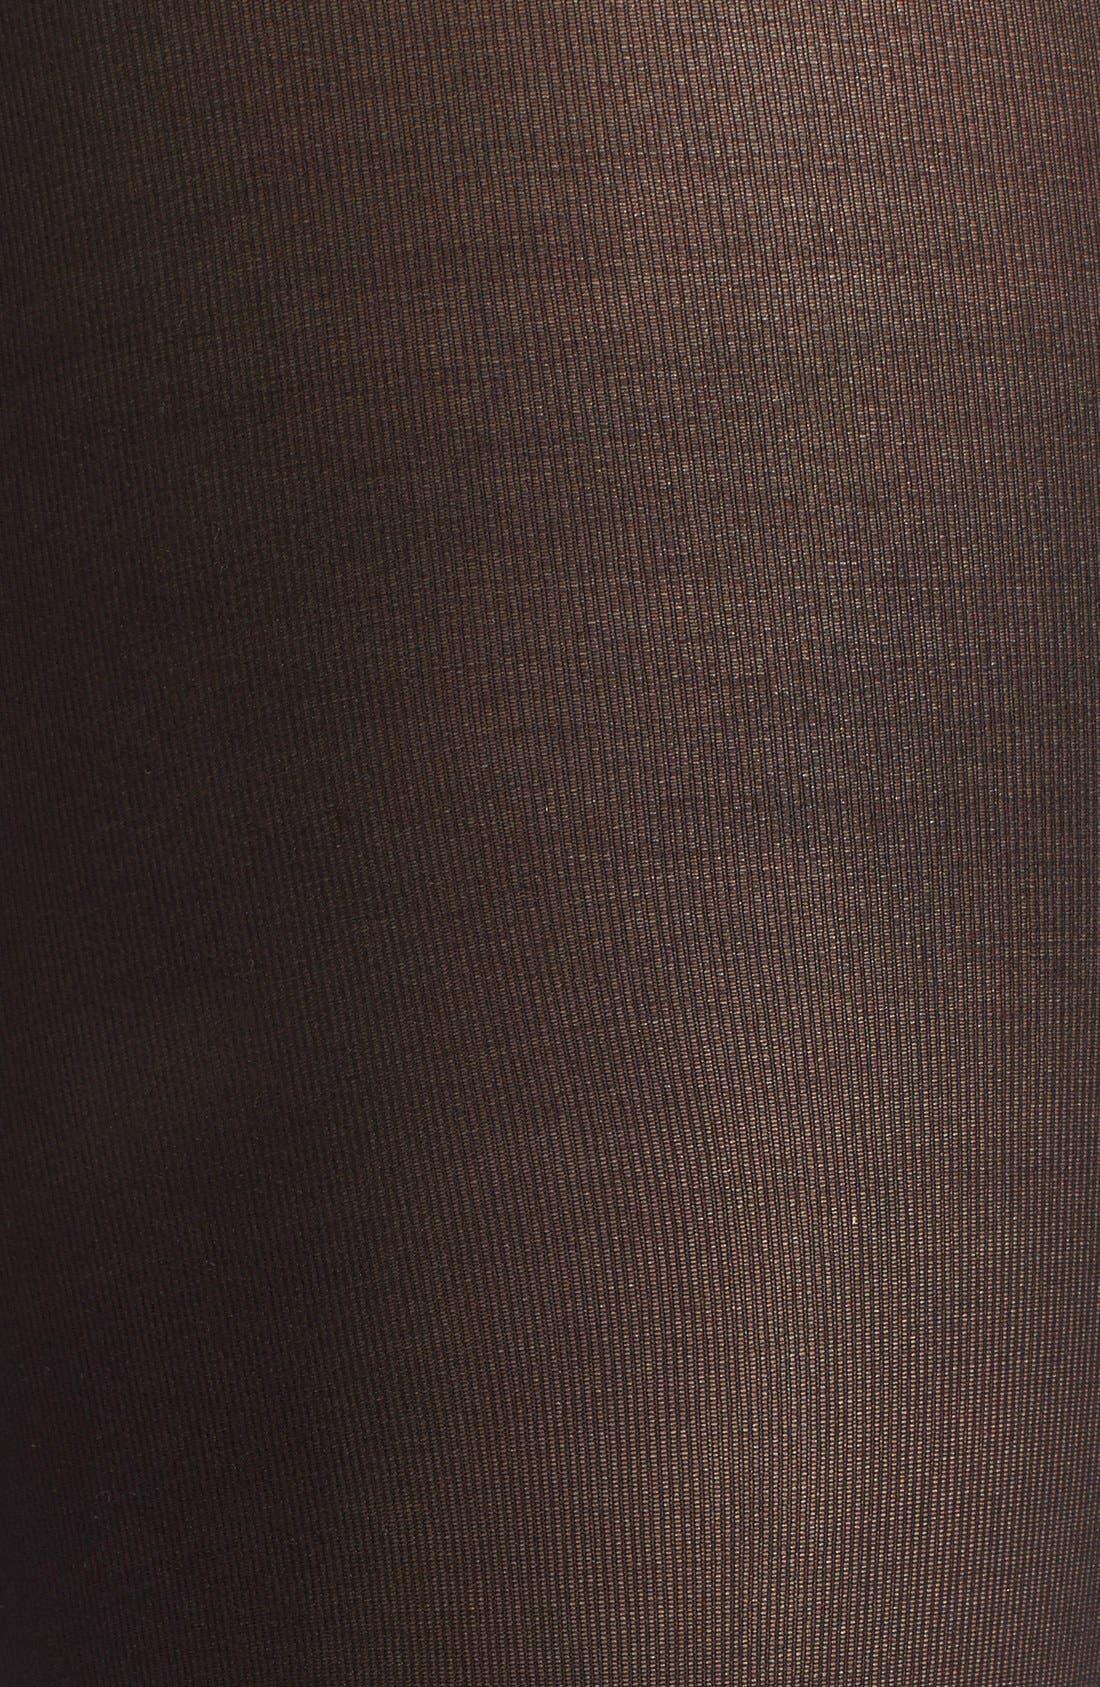 'Semi Opaque' 35 Denier Tights,                             Alternate thumbnail 2, color,                             Black